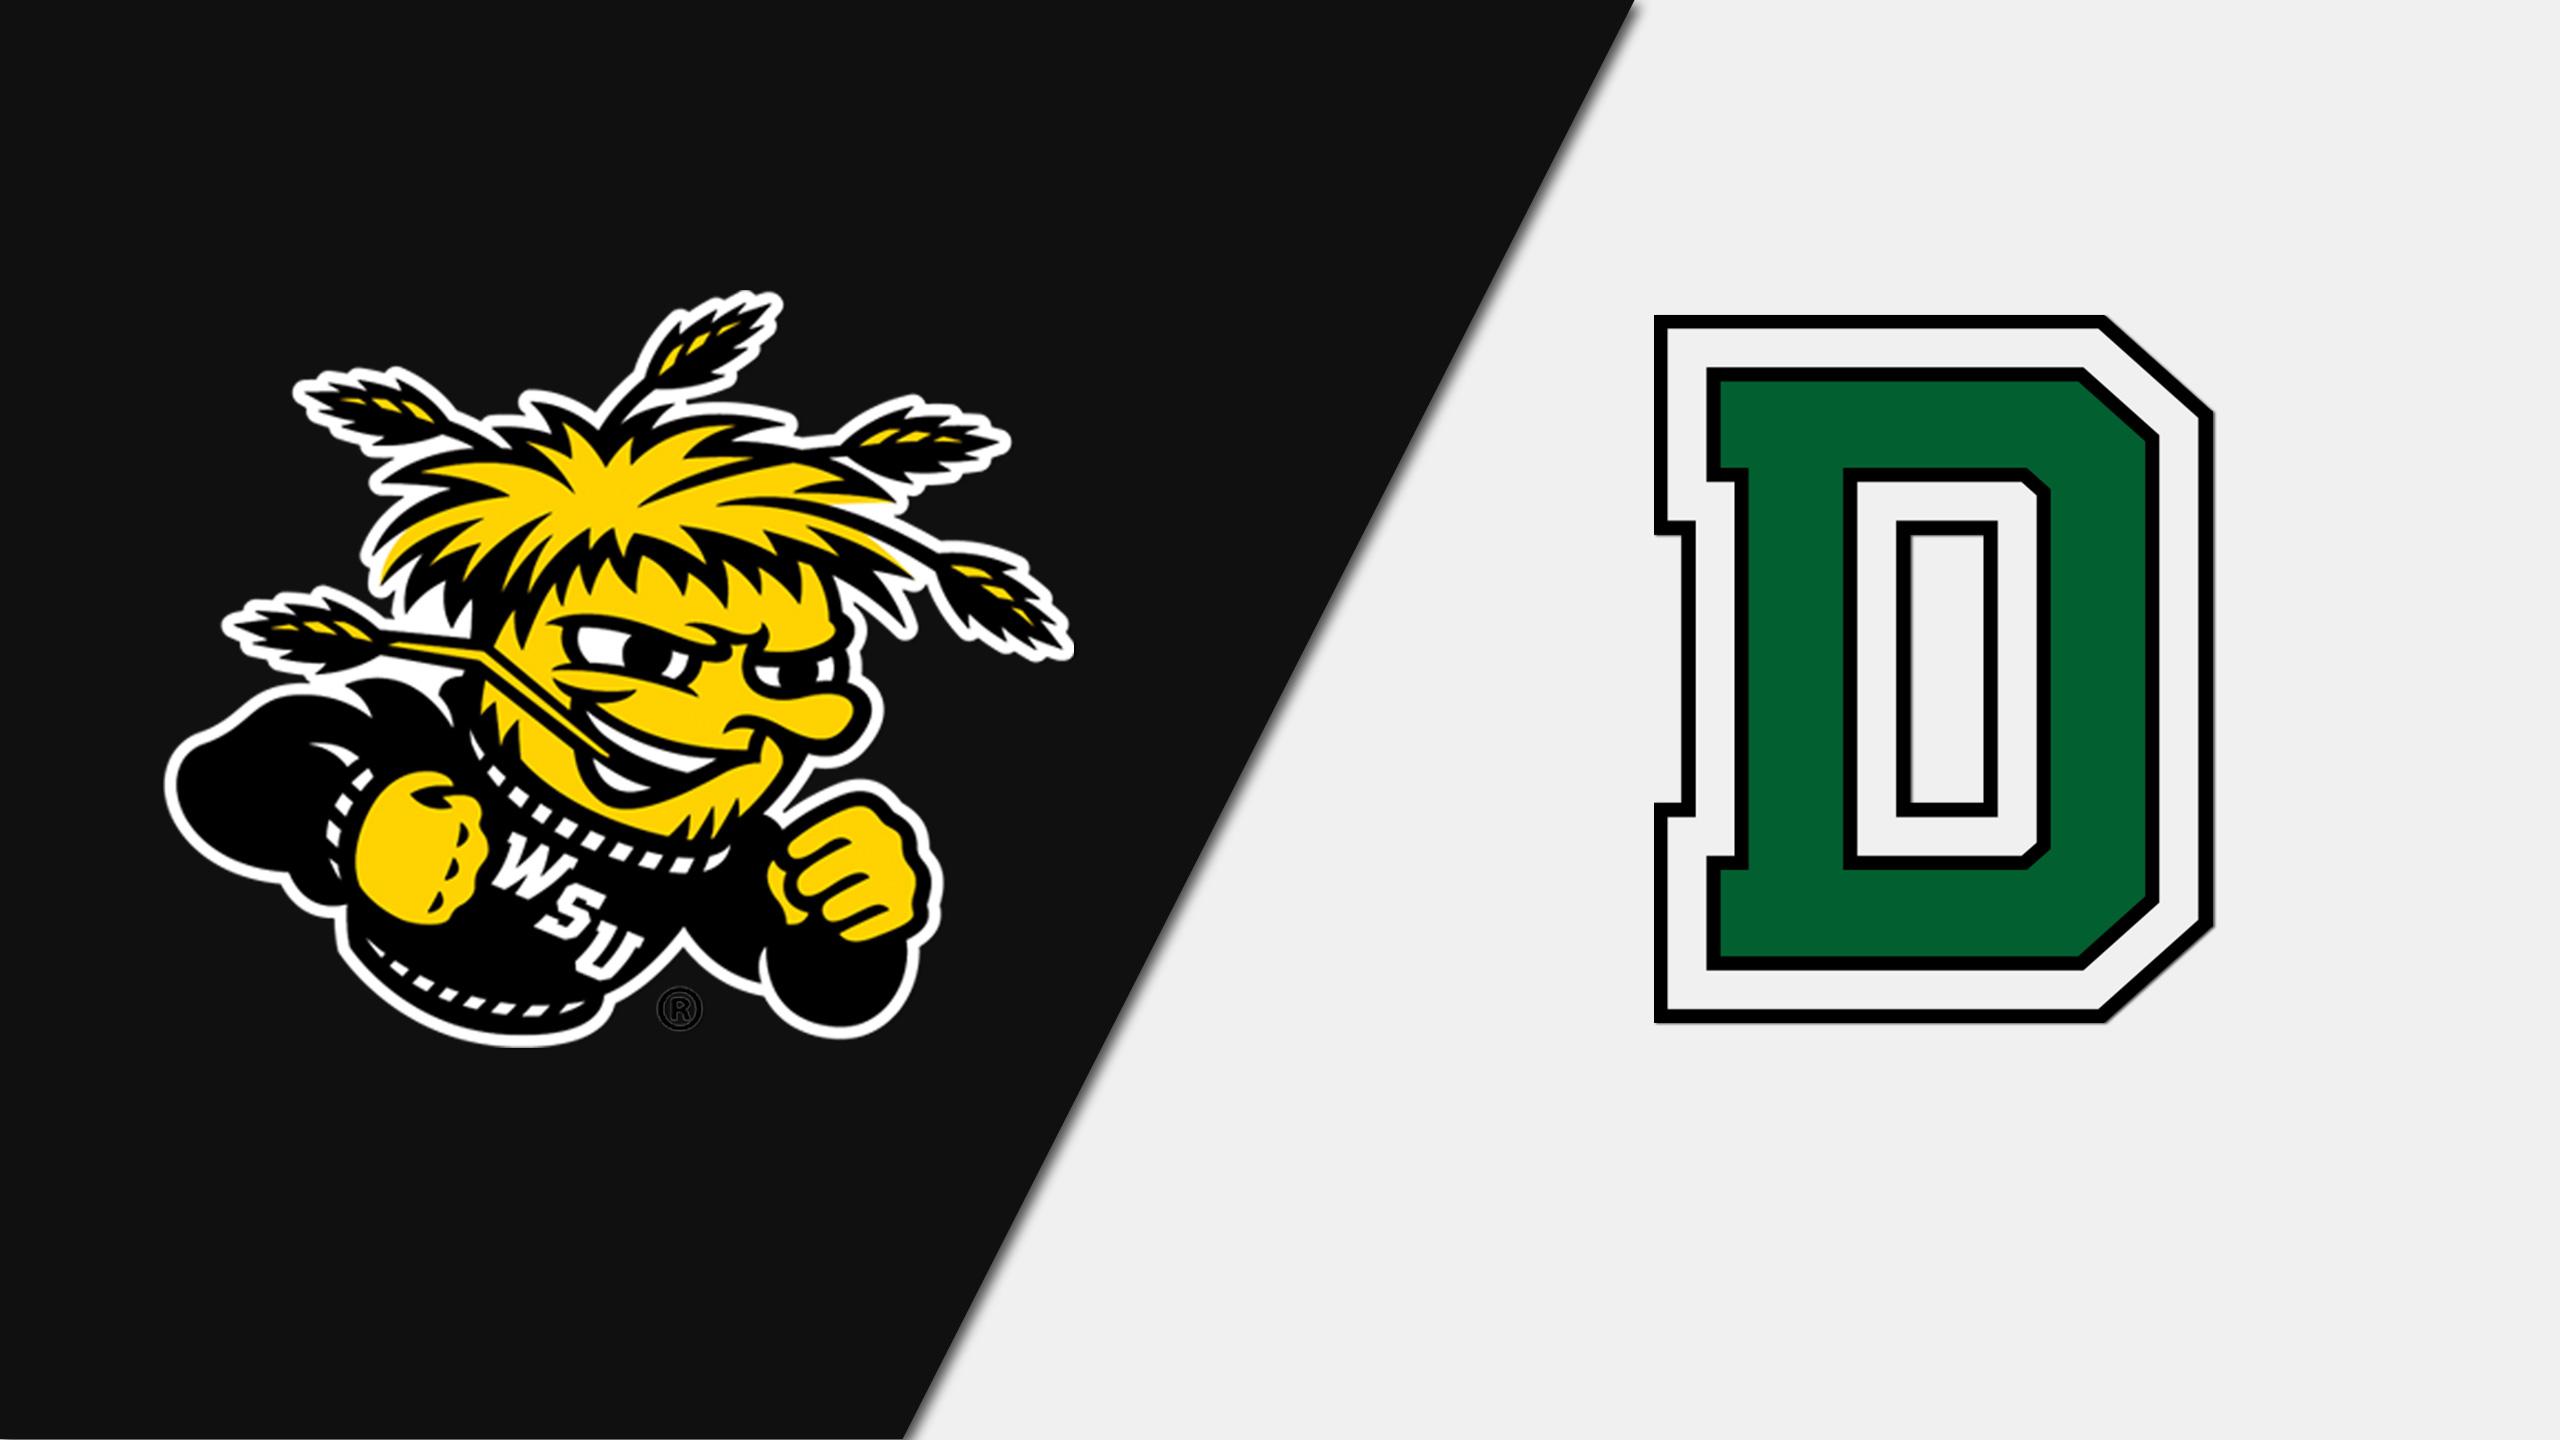 Wichita State vs. Dartmouth (Court 5)